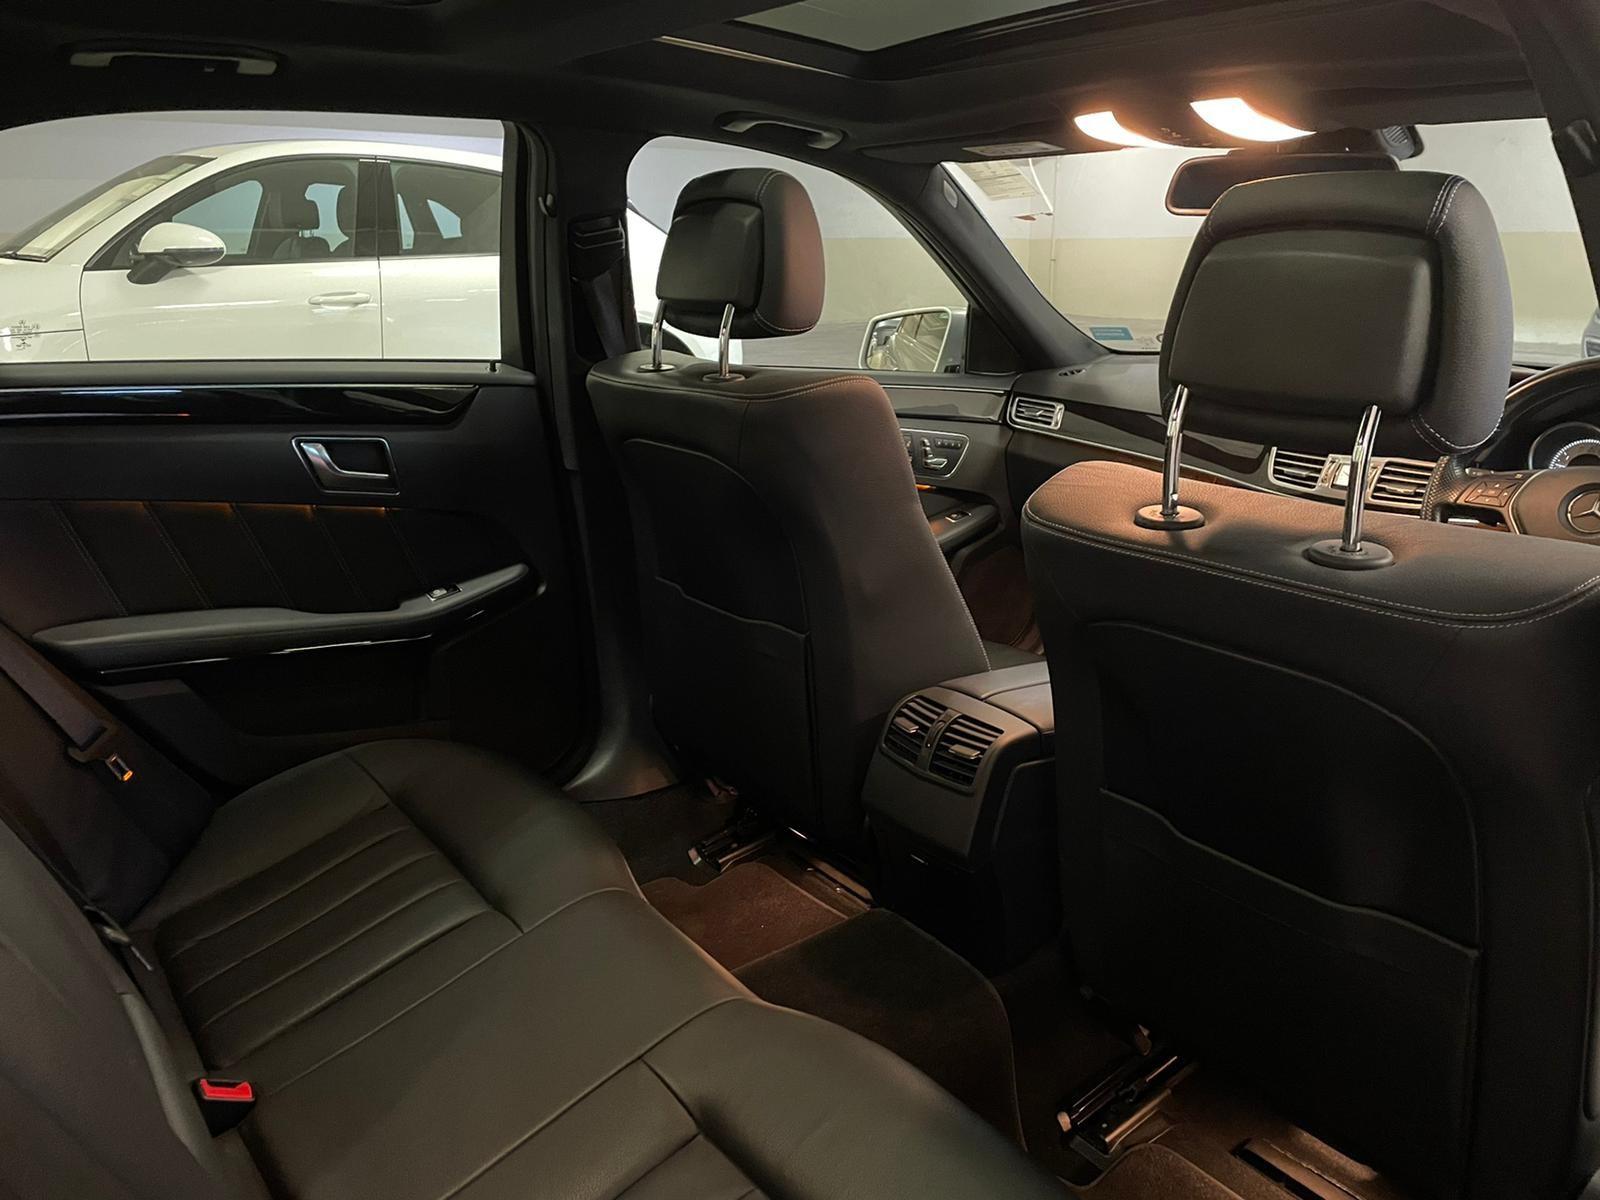 E220 Bluetec Avantgard Facelift (W212) - Image 5